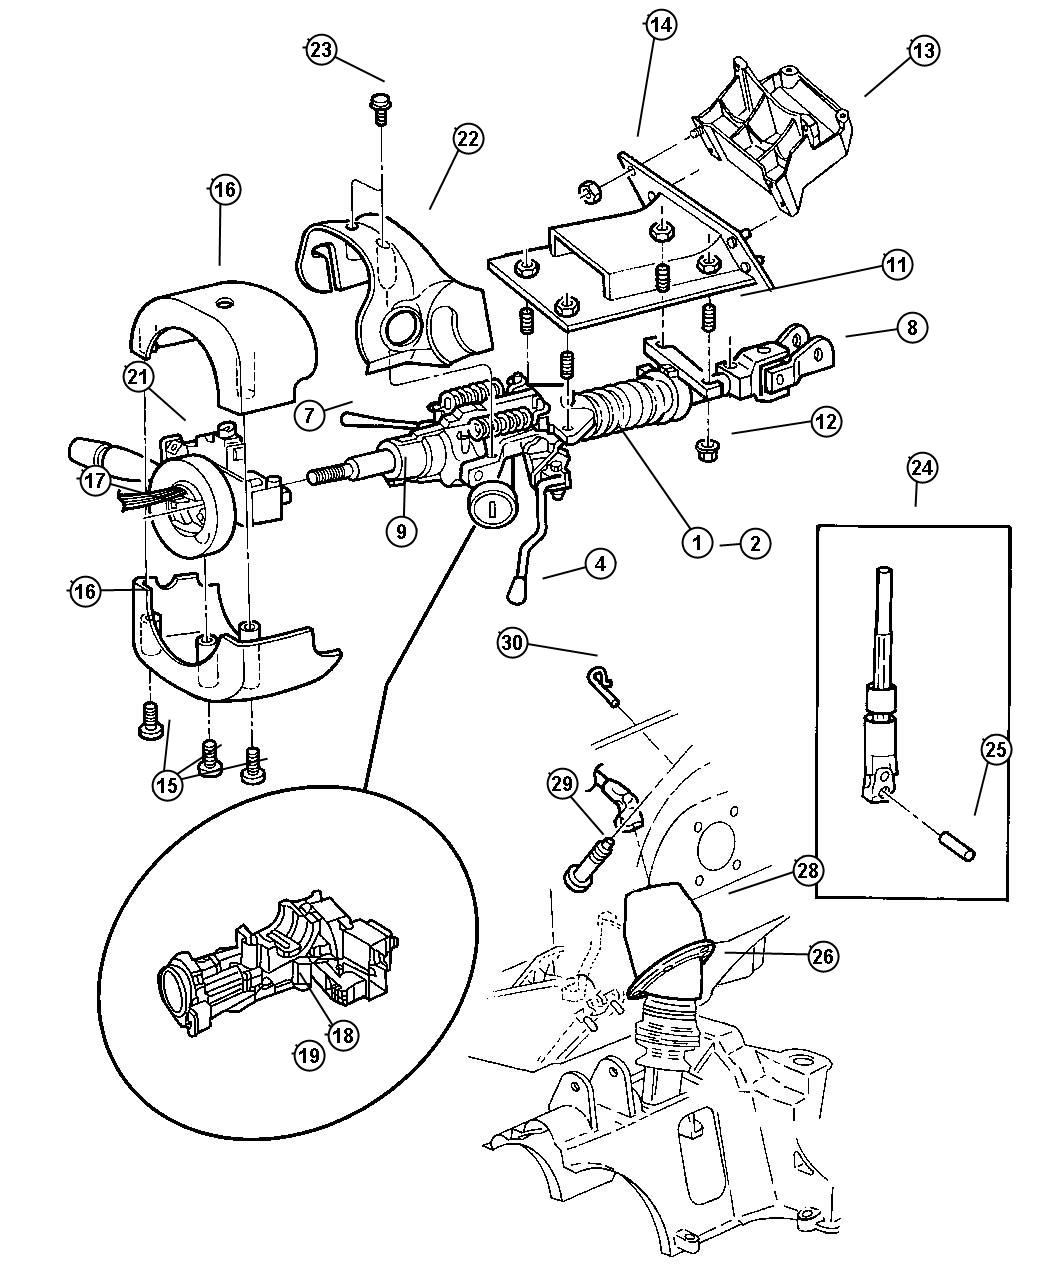 Loose Tilt Steering Wheel On A Chrysler Voyager How To Fix